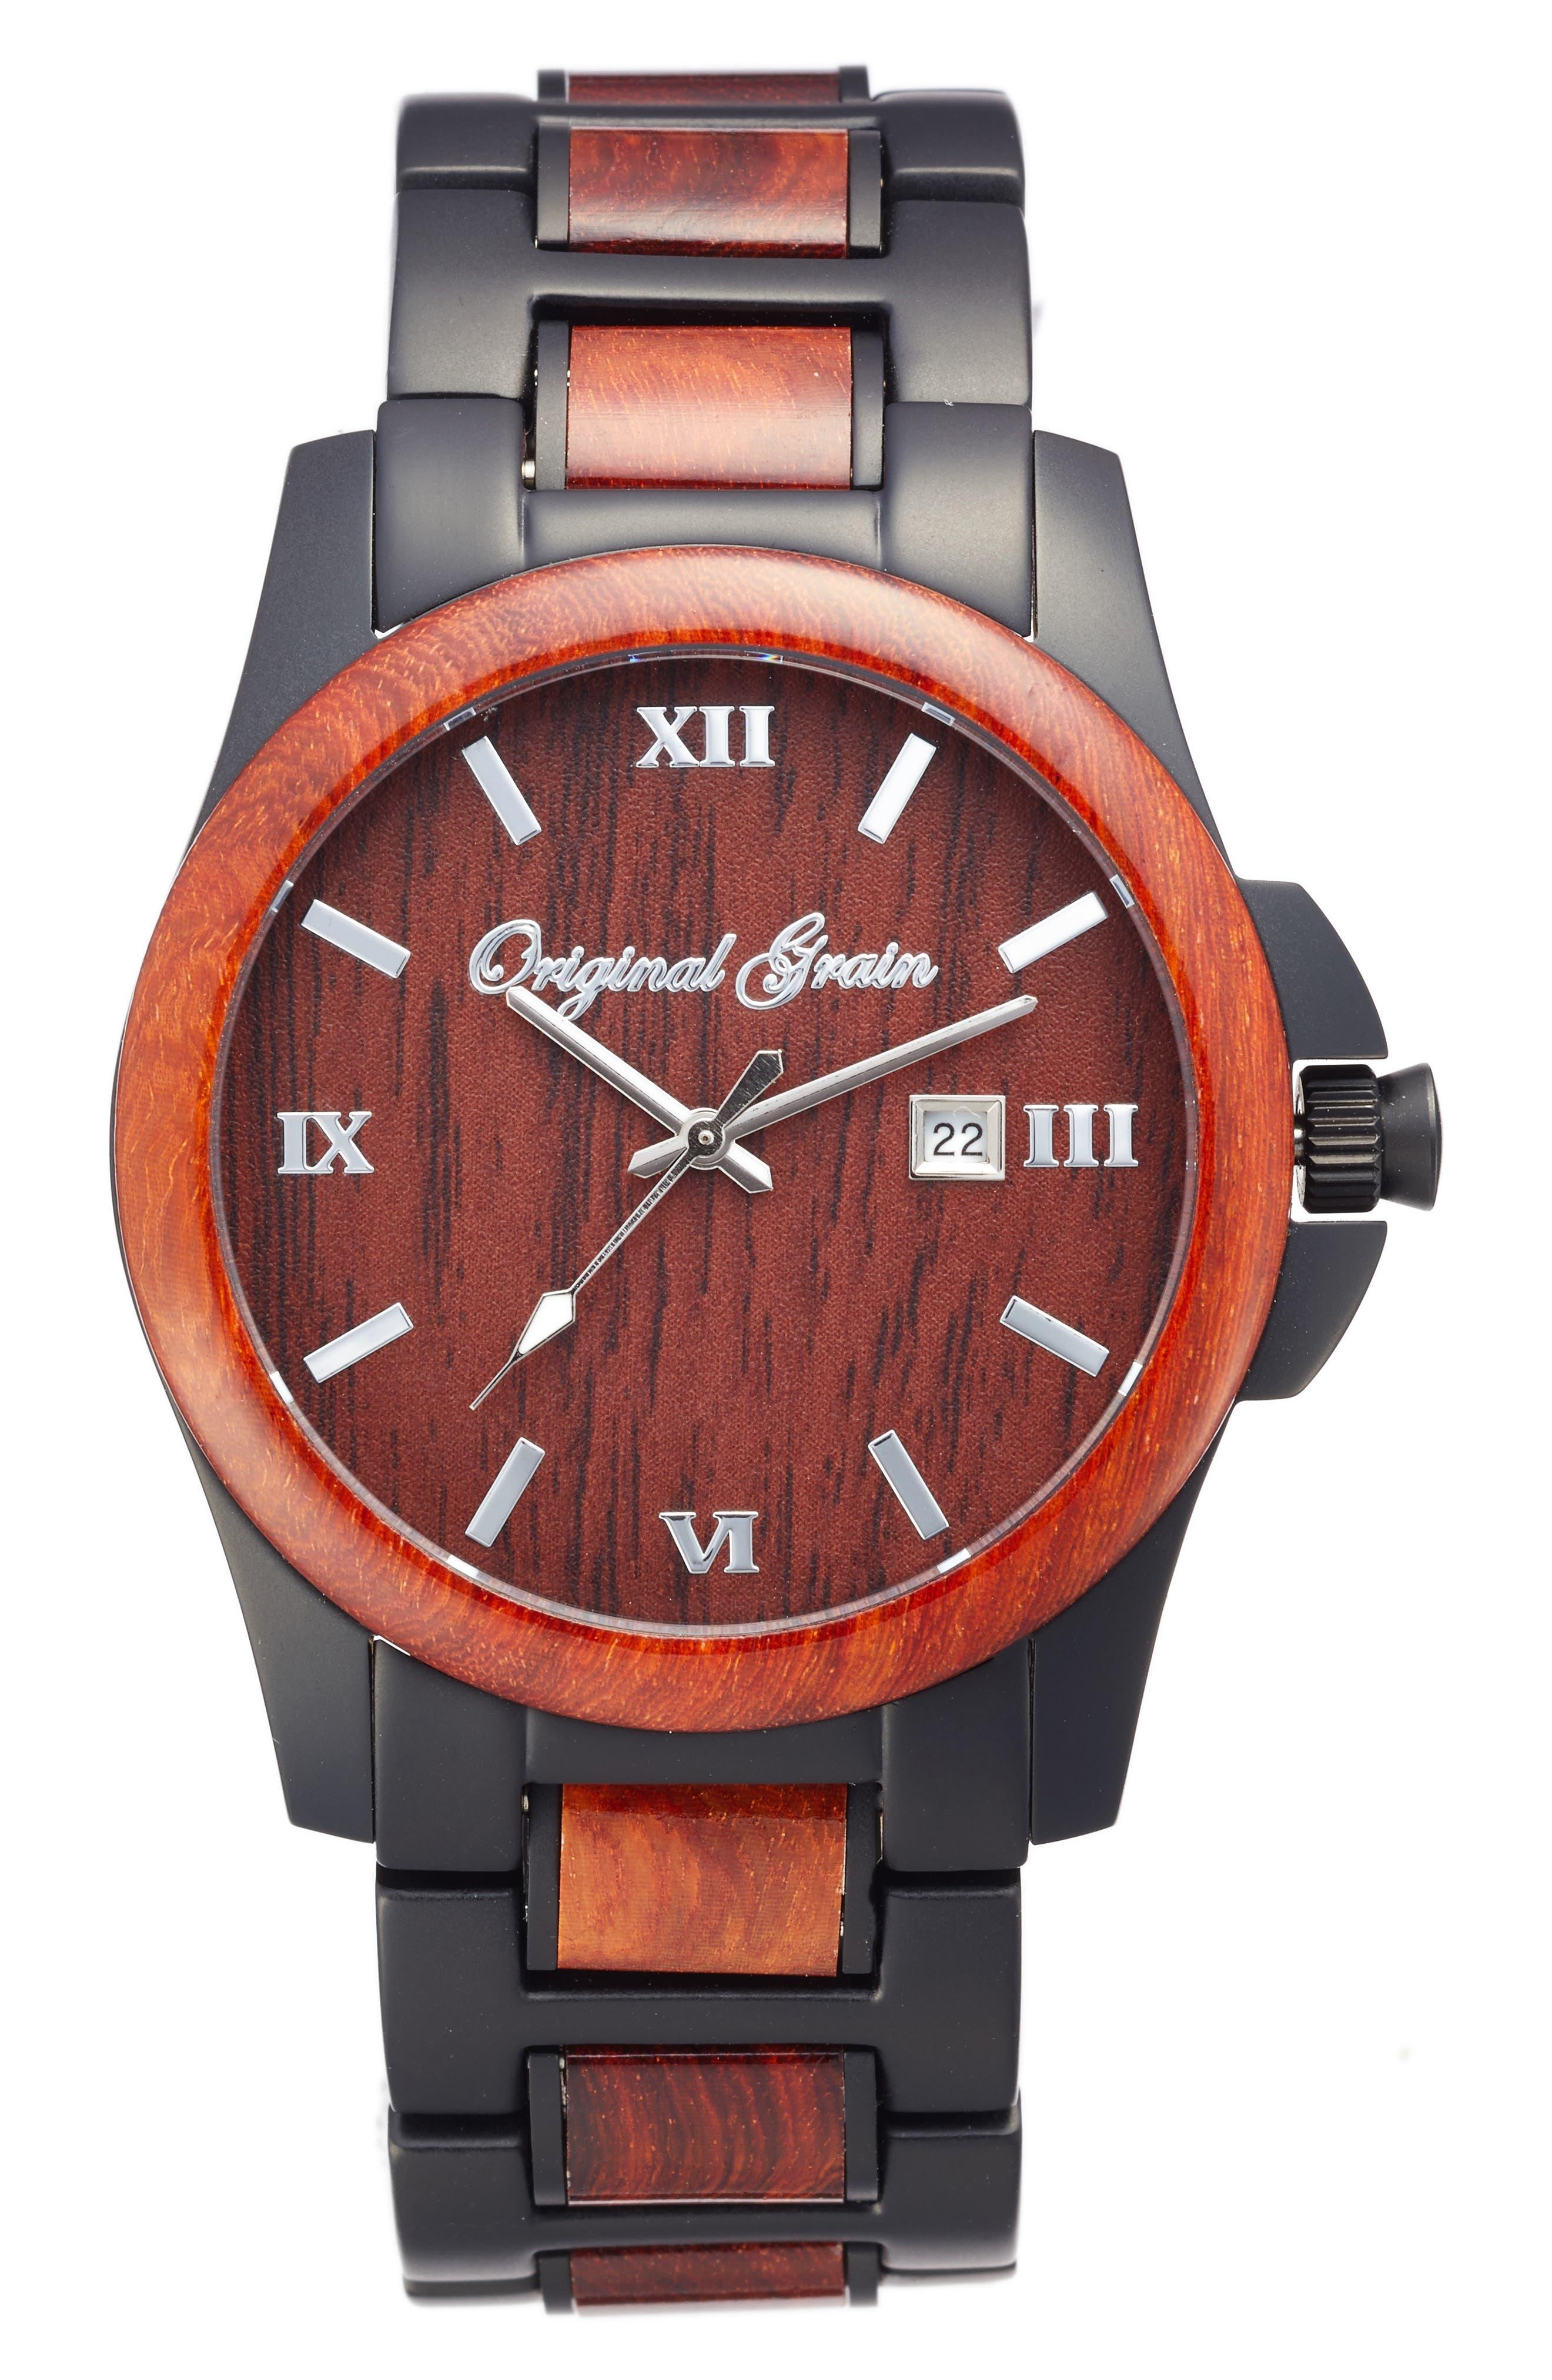 Main Image - Original Grain The Classic Bracelet Watch, 43mm